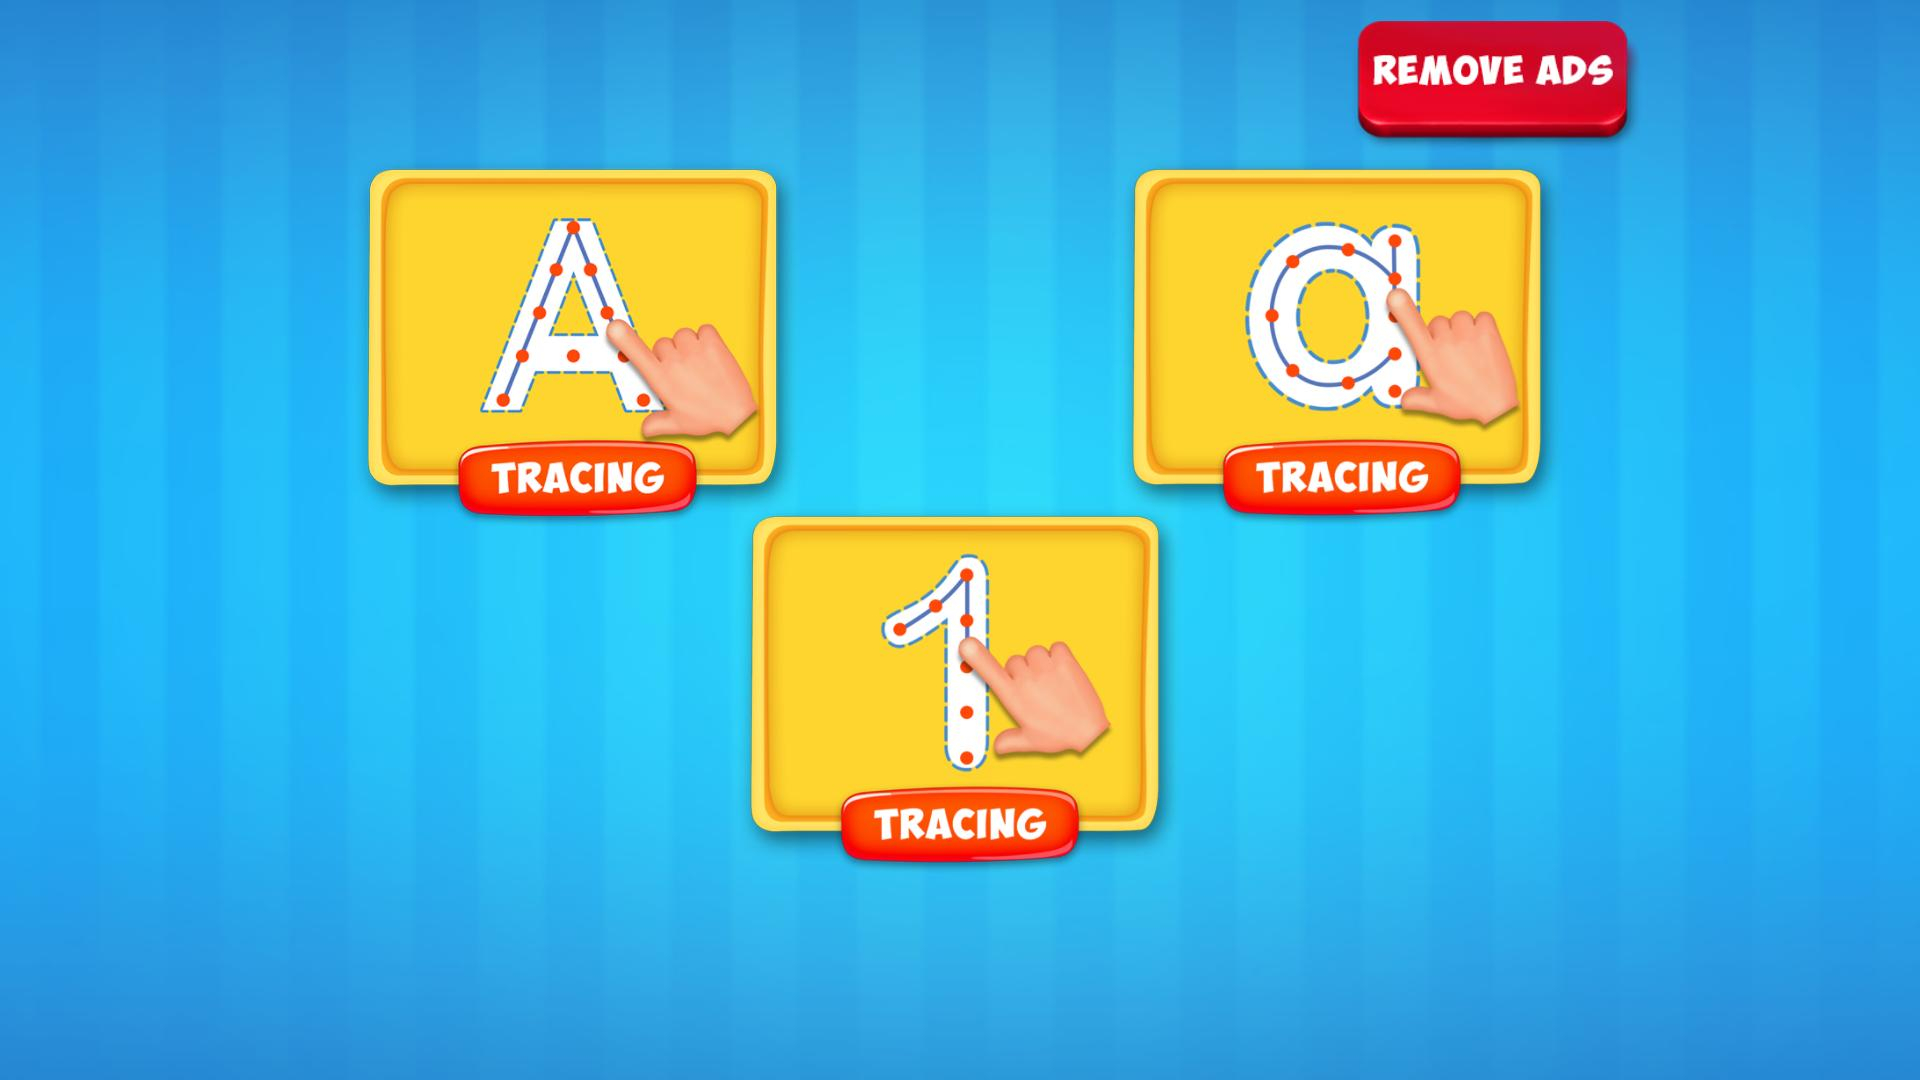 Abc Alphabet Tracing For Android - Apk Download regarding Alphabet Tracing Game App